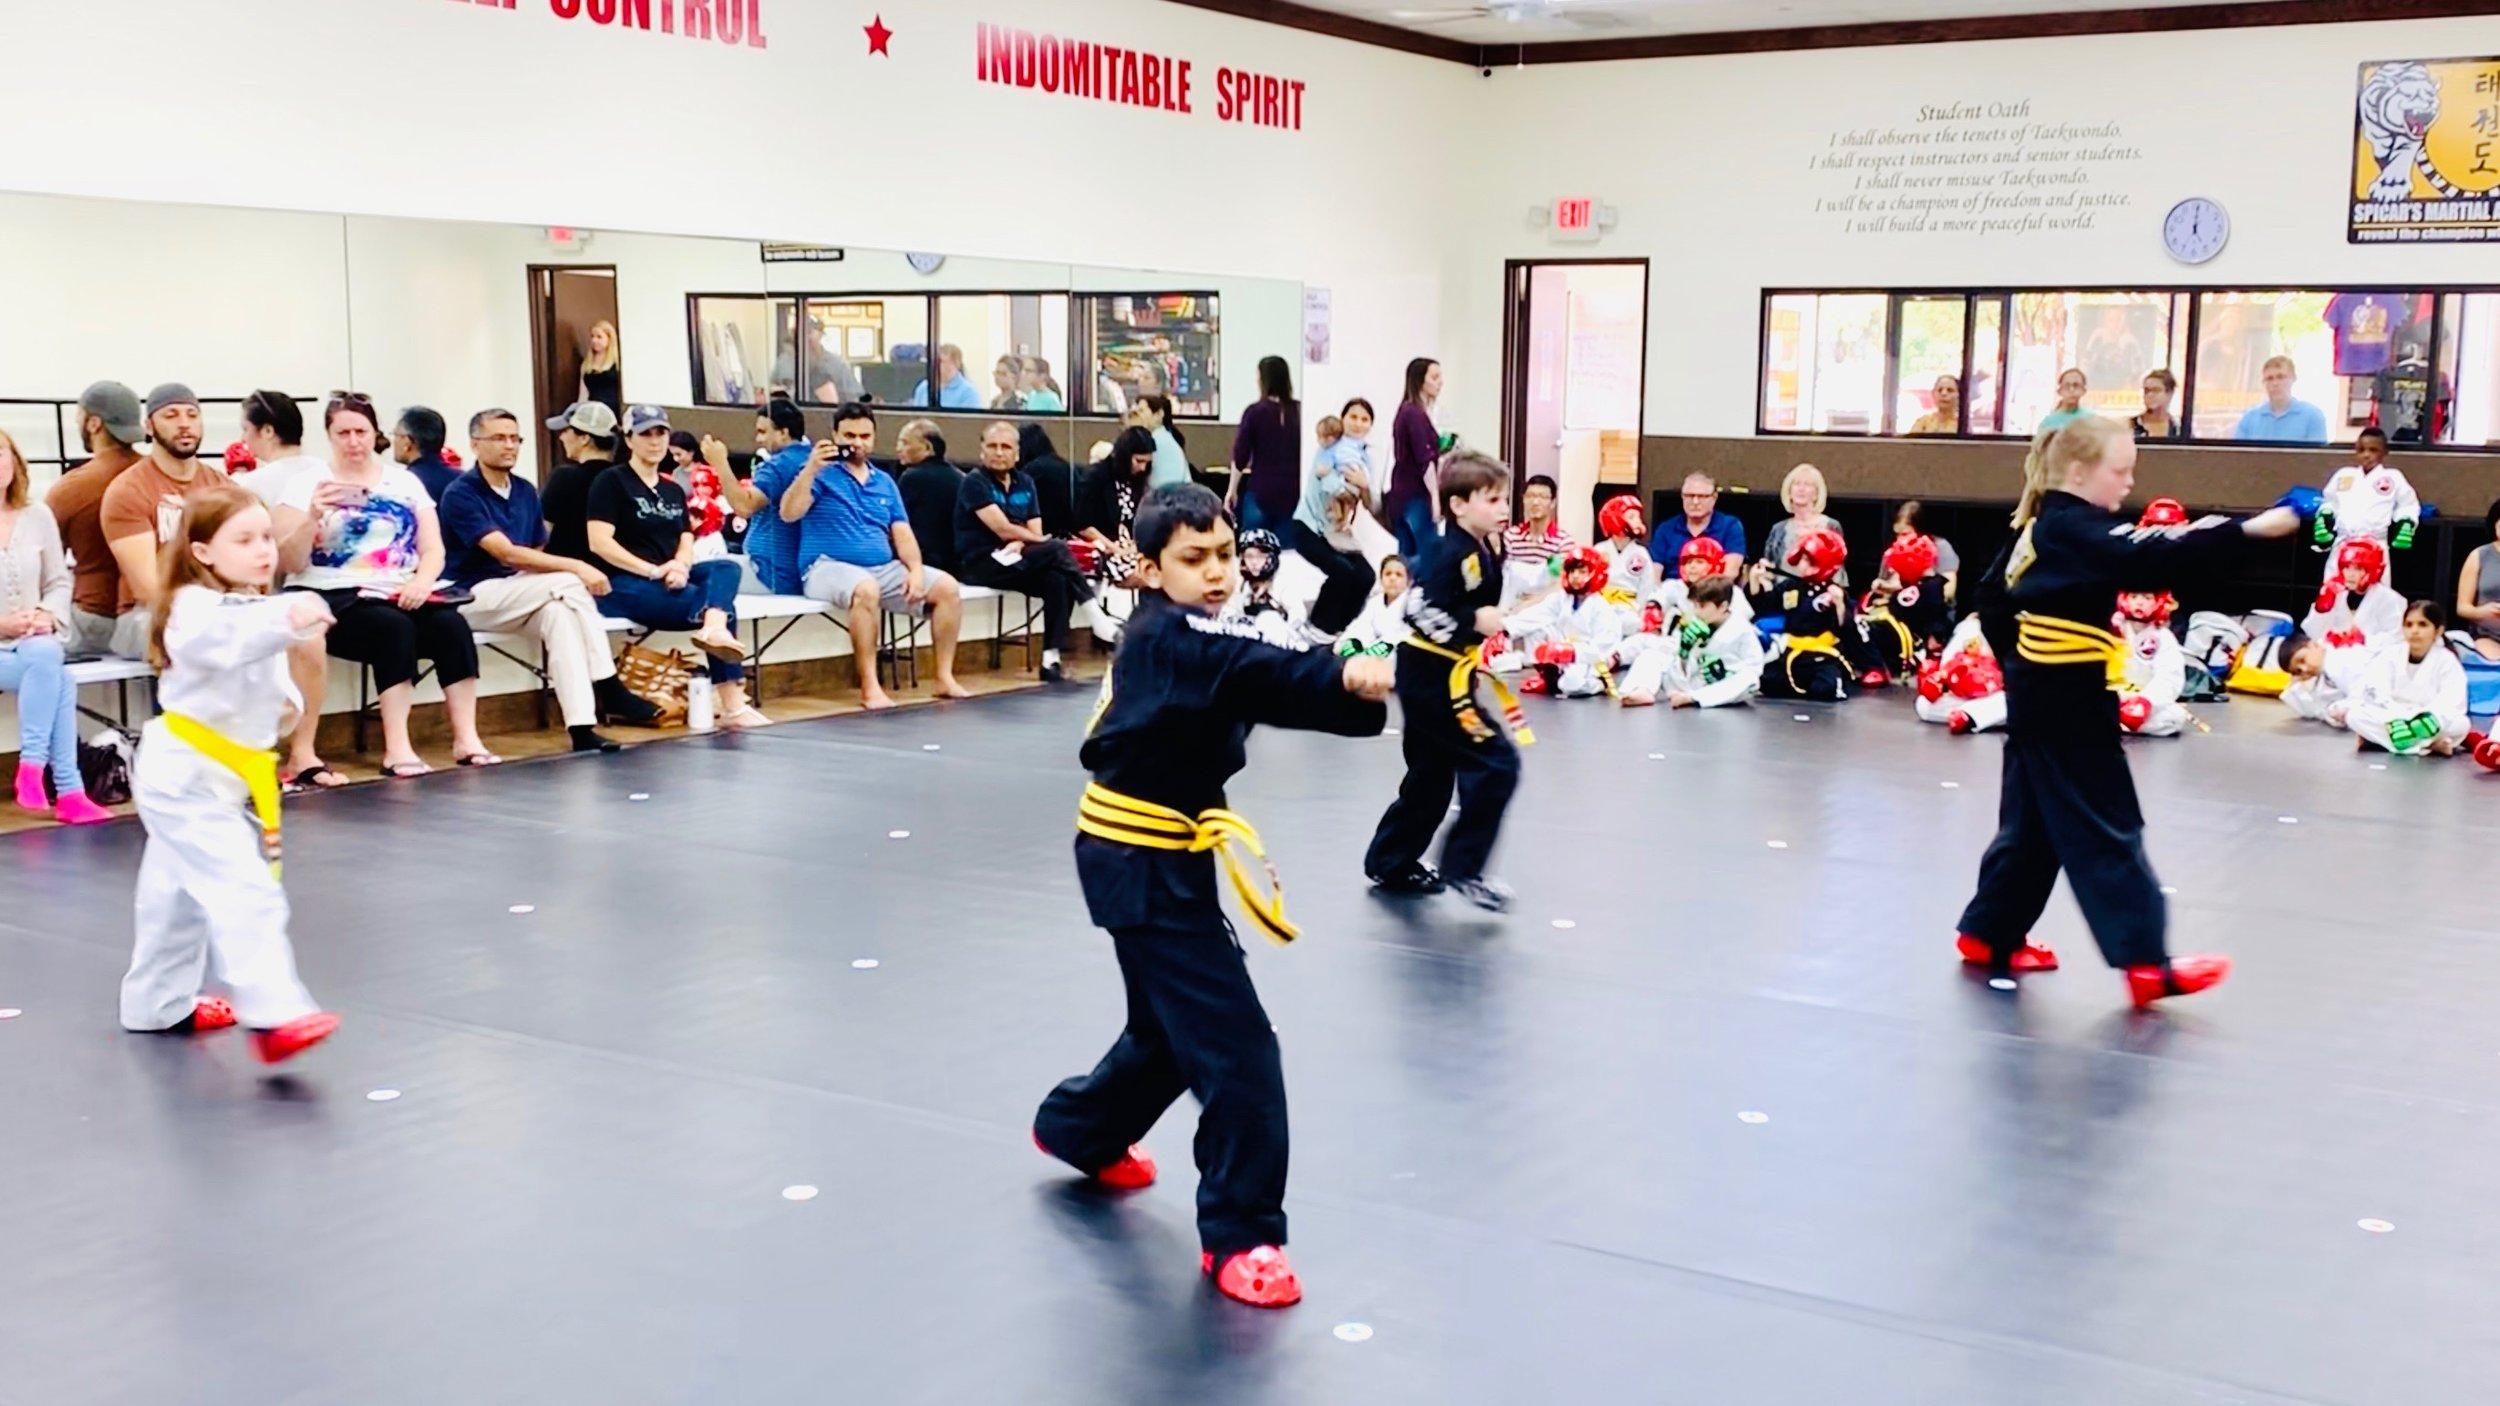 karate-kids-belt-test-southlake-texas.jpeg